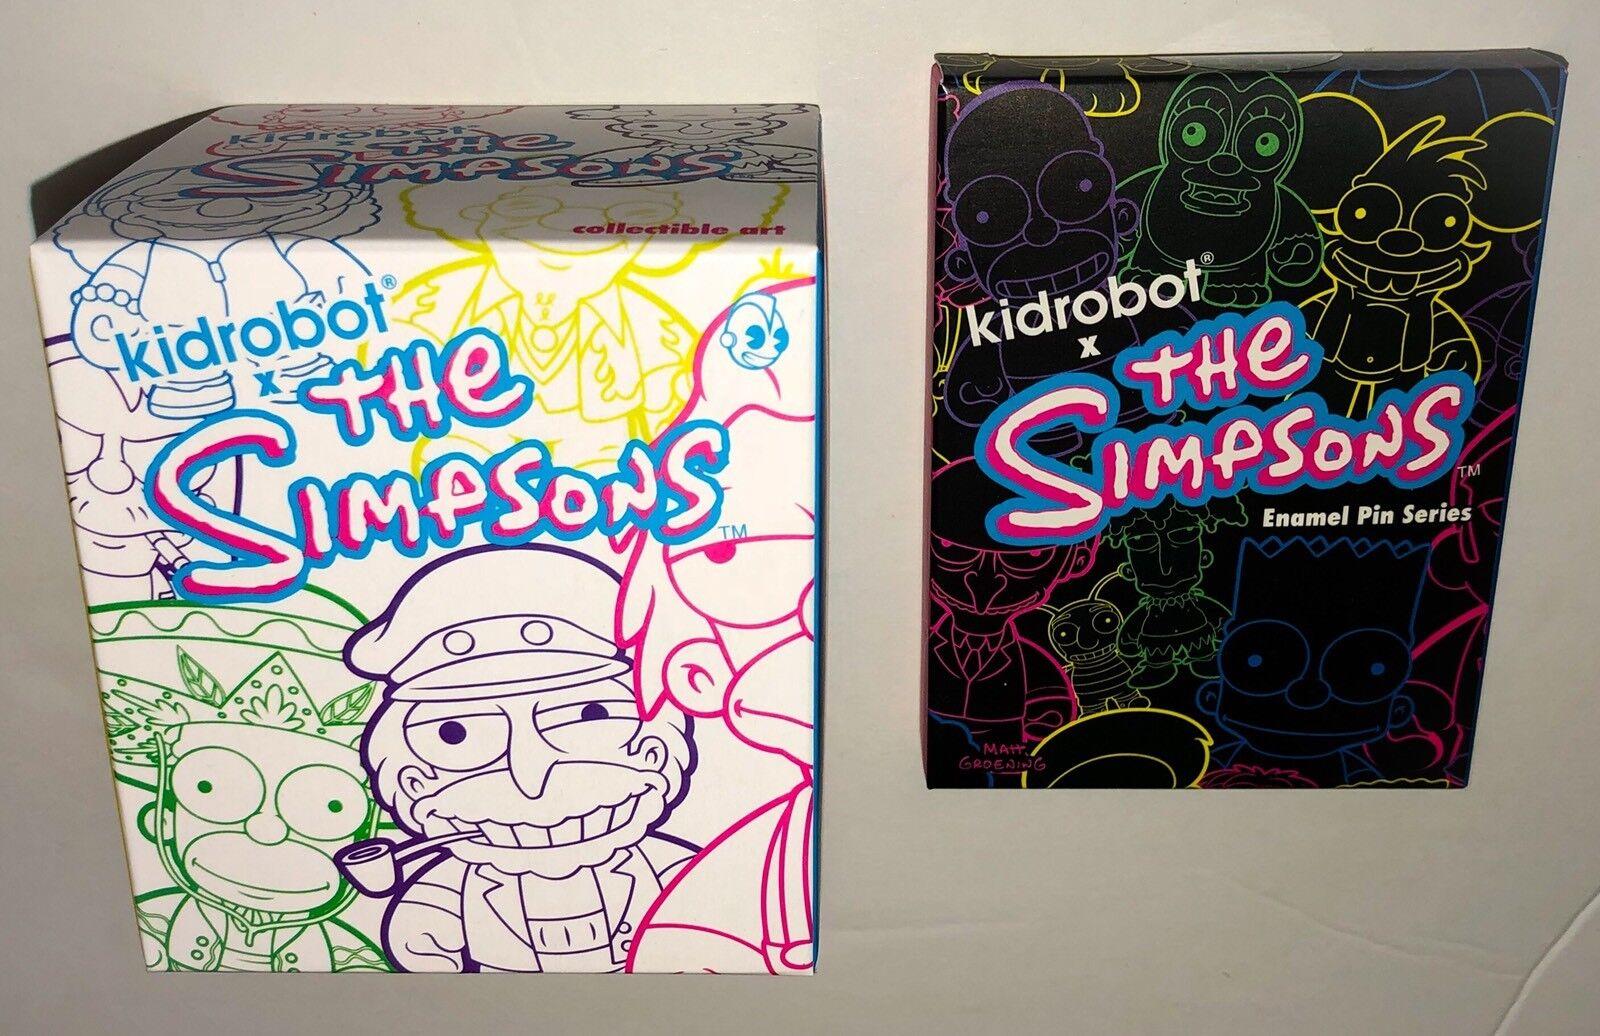 KIDROBOT The Simpsons Series 2 Blindbox Figure + Enamel Pin Mystery Blind Boxes